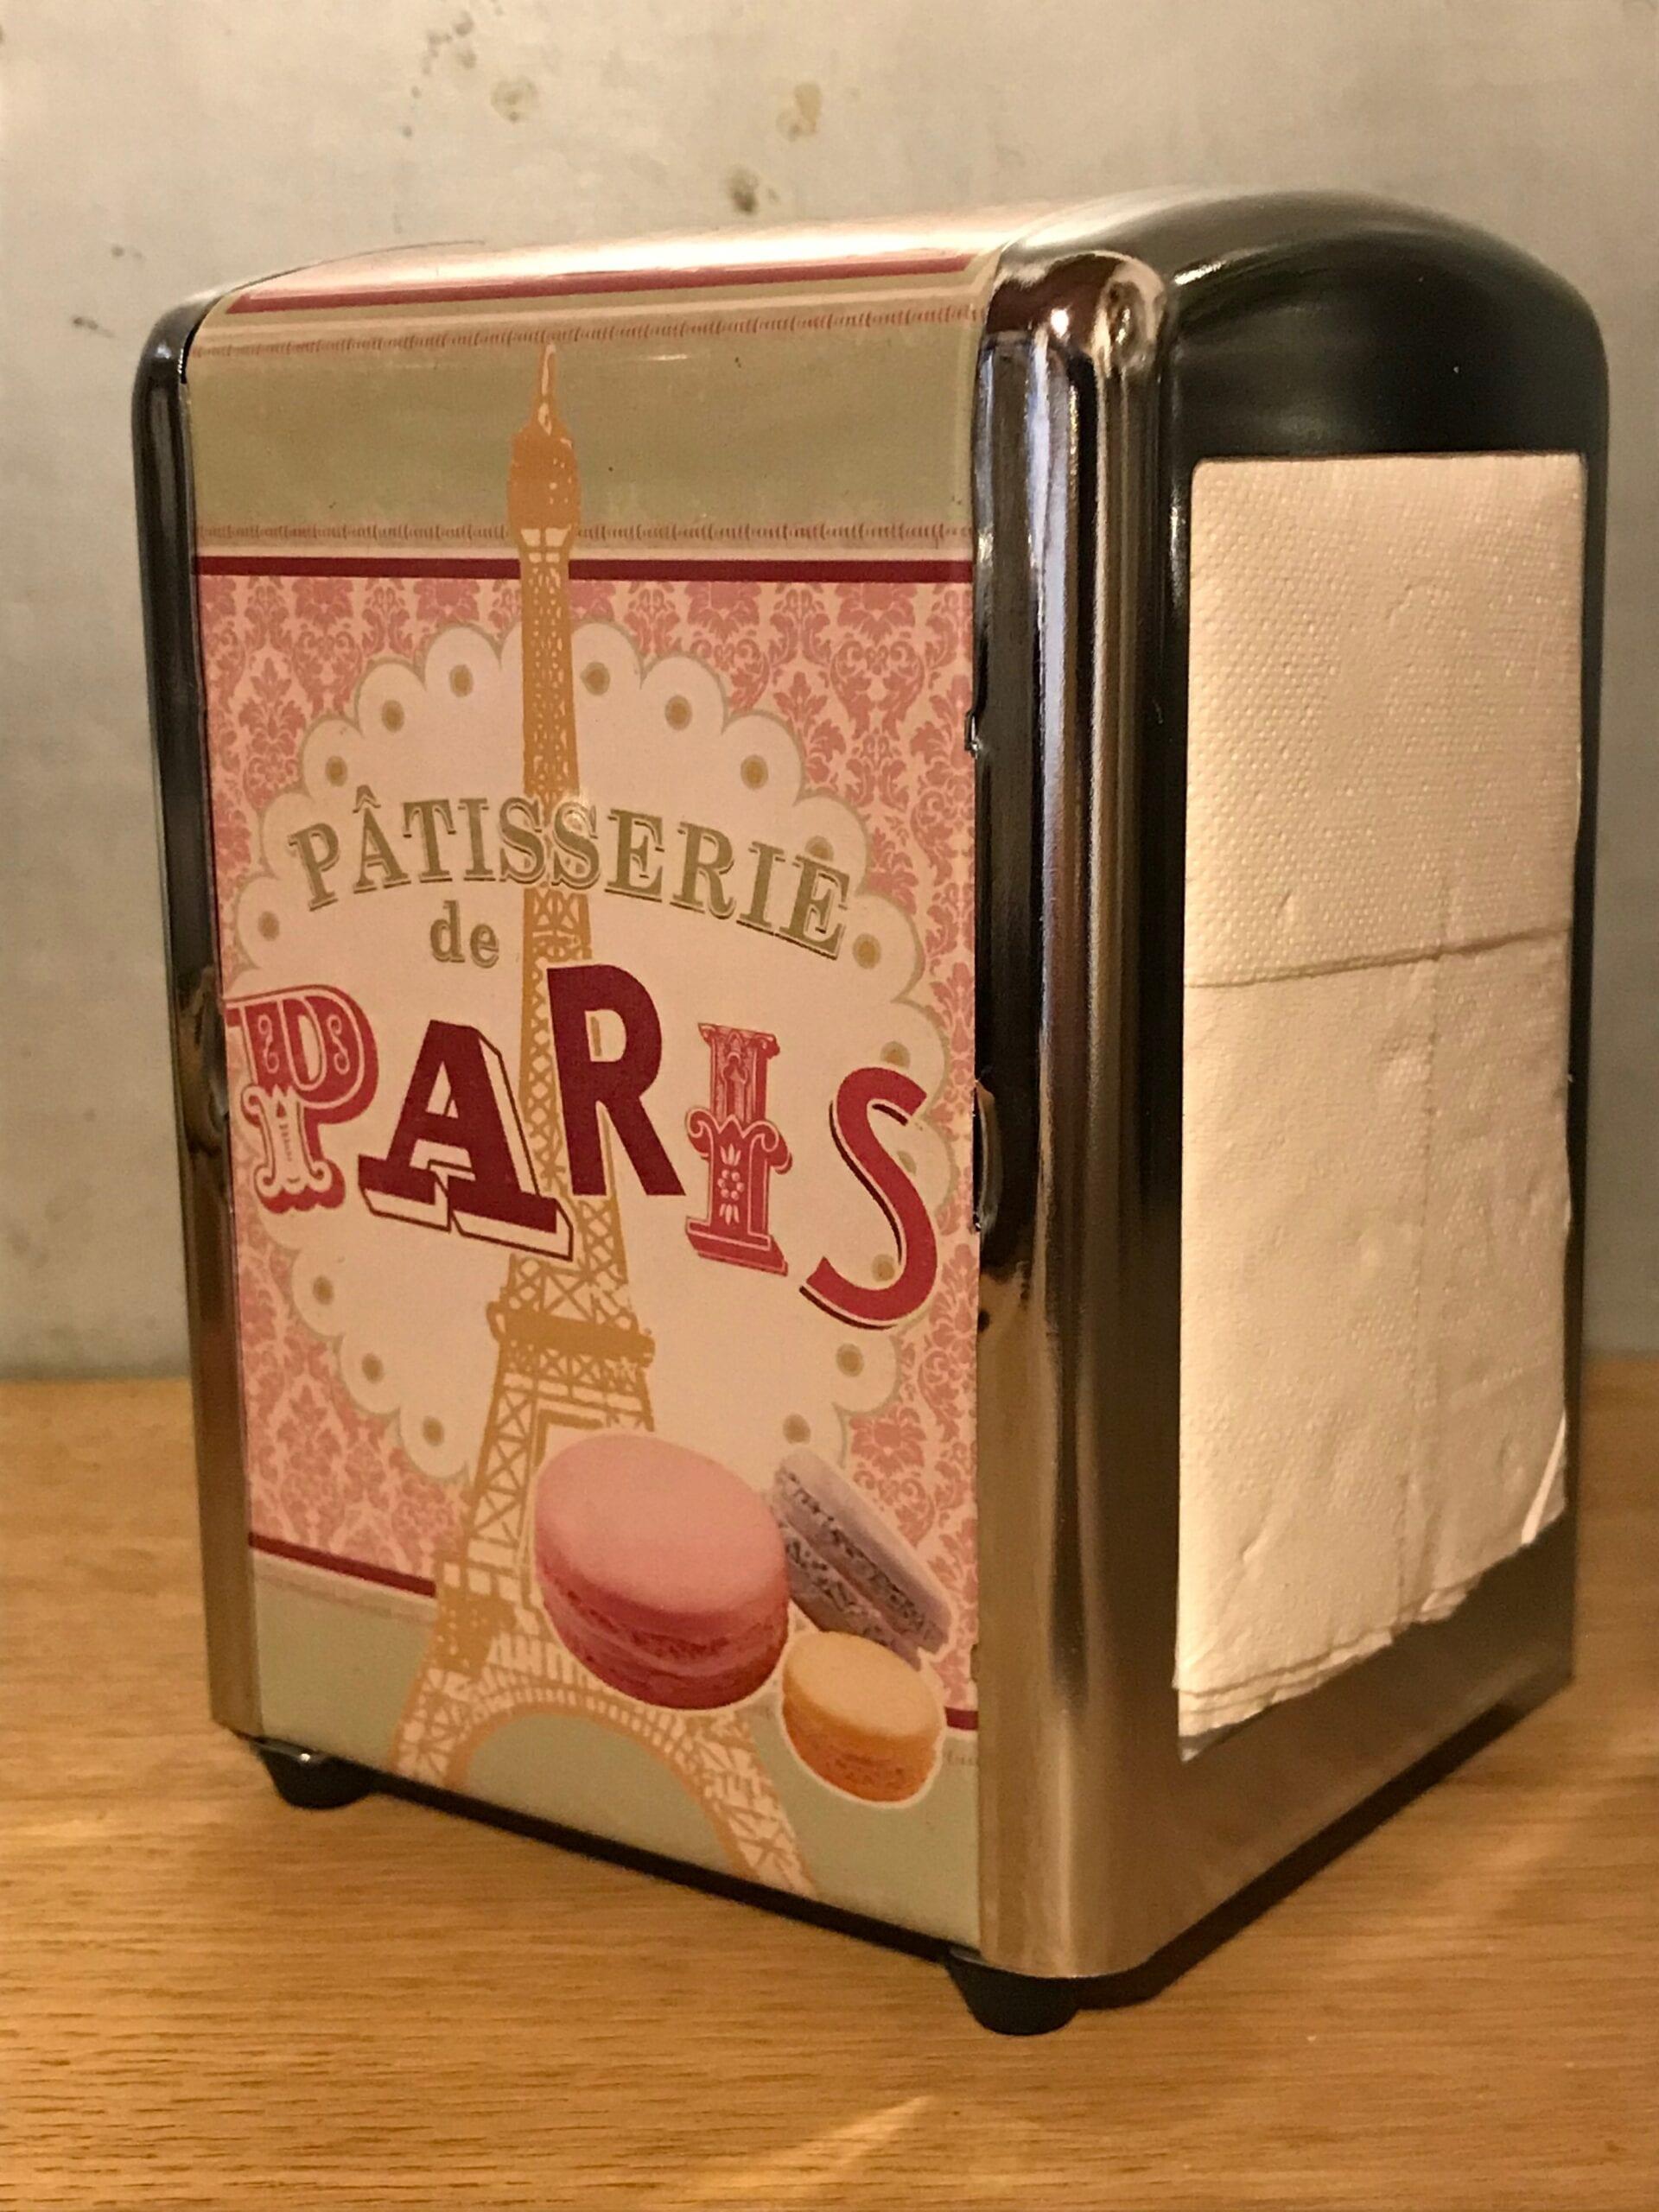 Porta tovagliolini – Patisserie de Paris